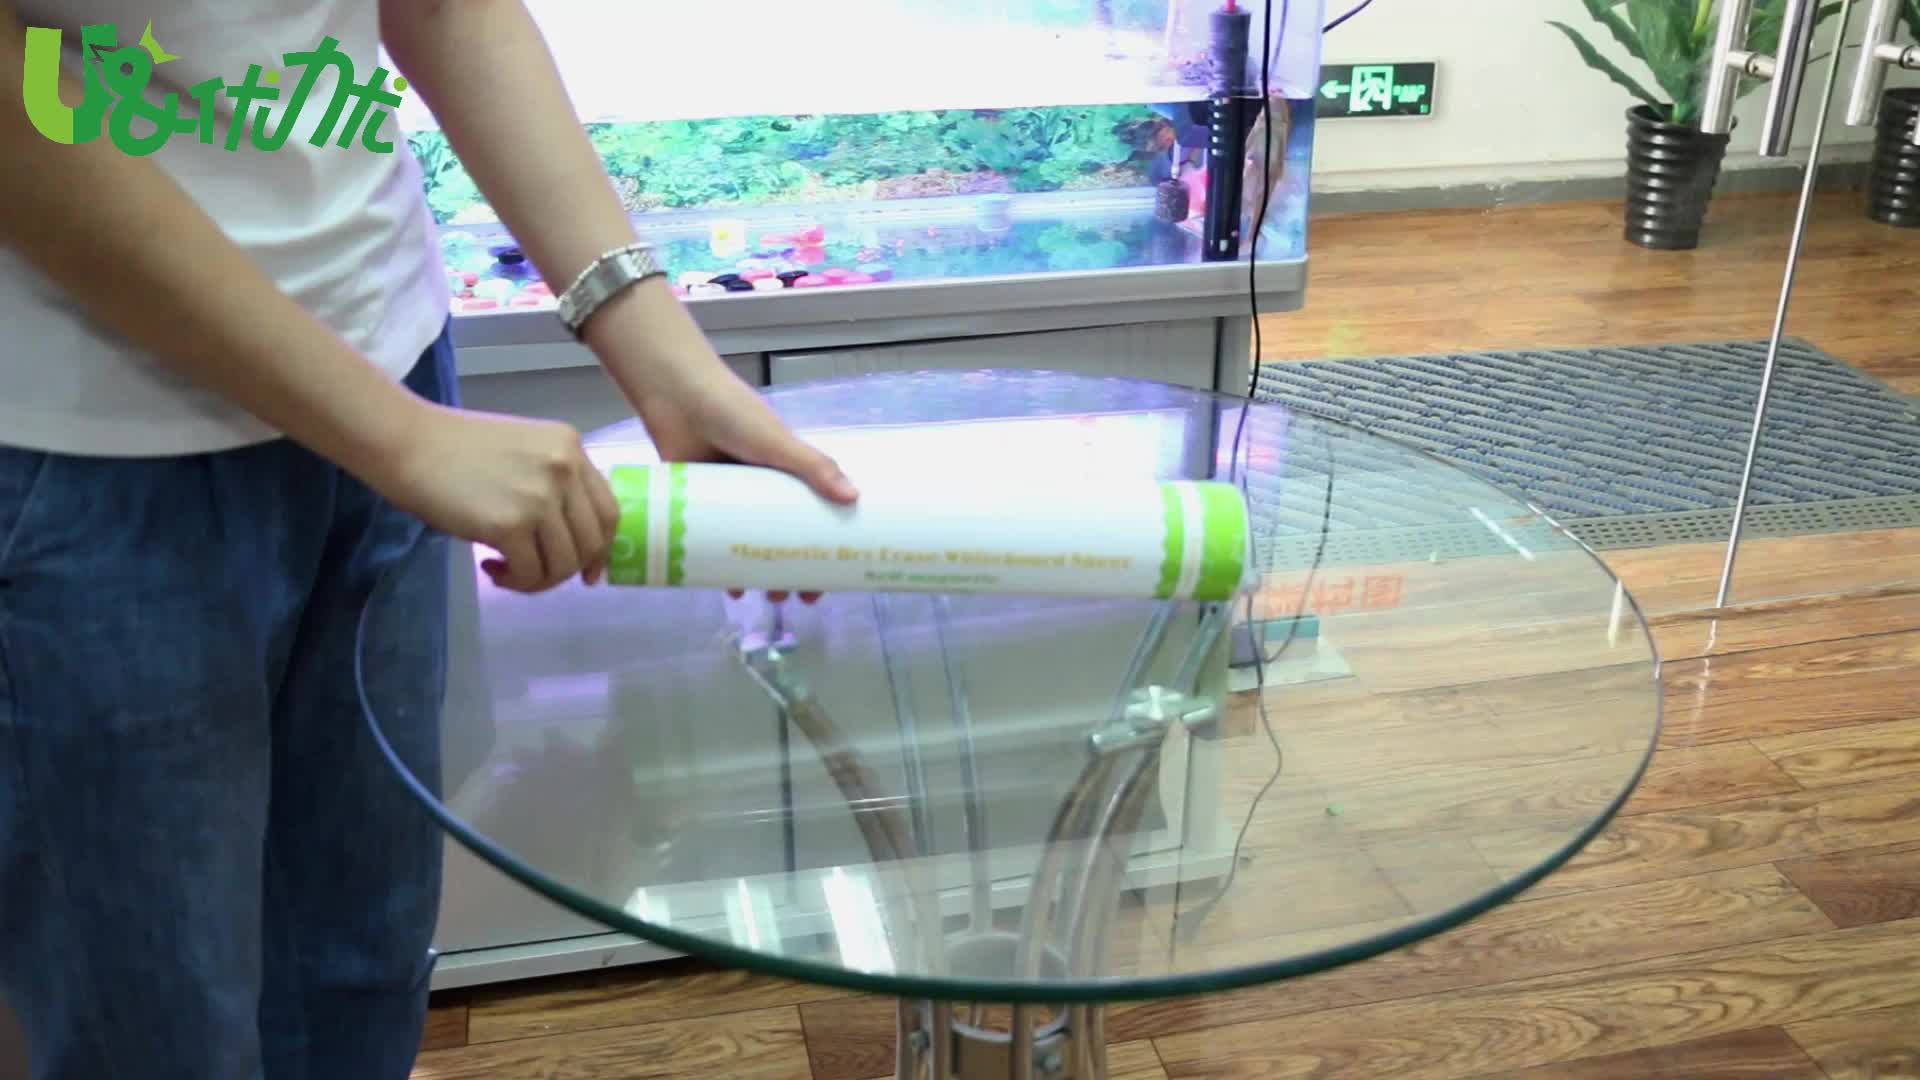 Школа и канцелярские товары белая доска пленка Rolling Dry Erase магнитный холодильник Whiteboard